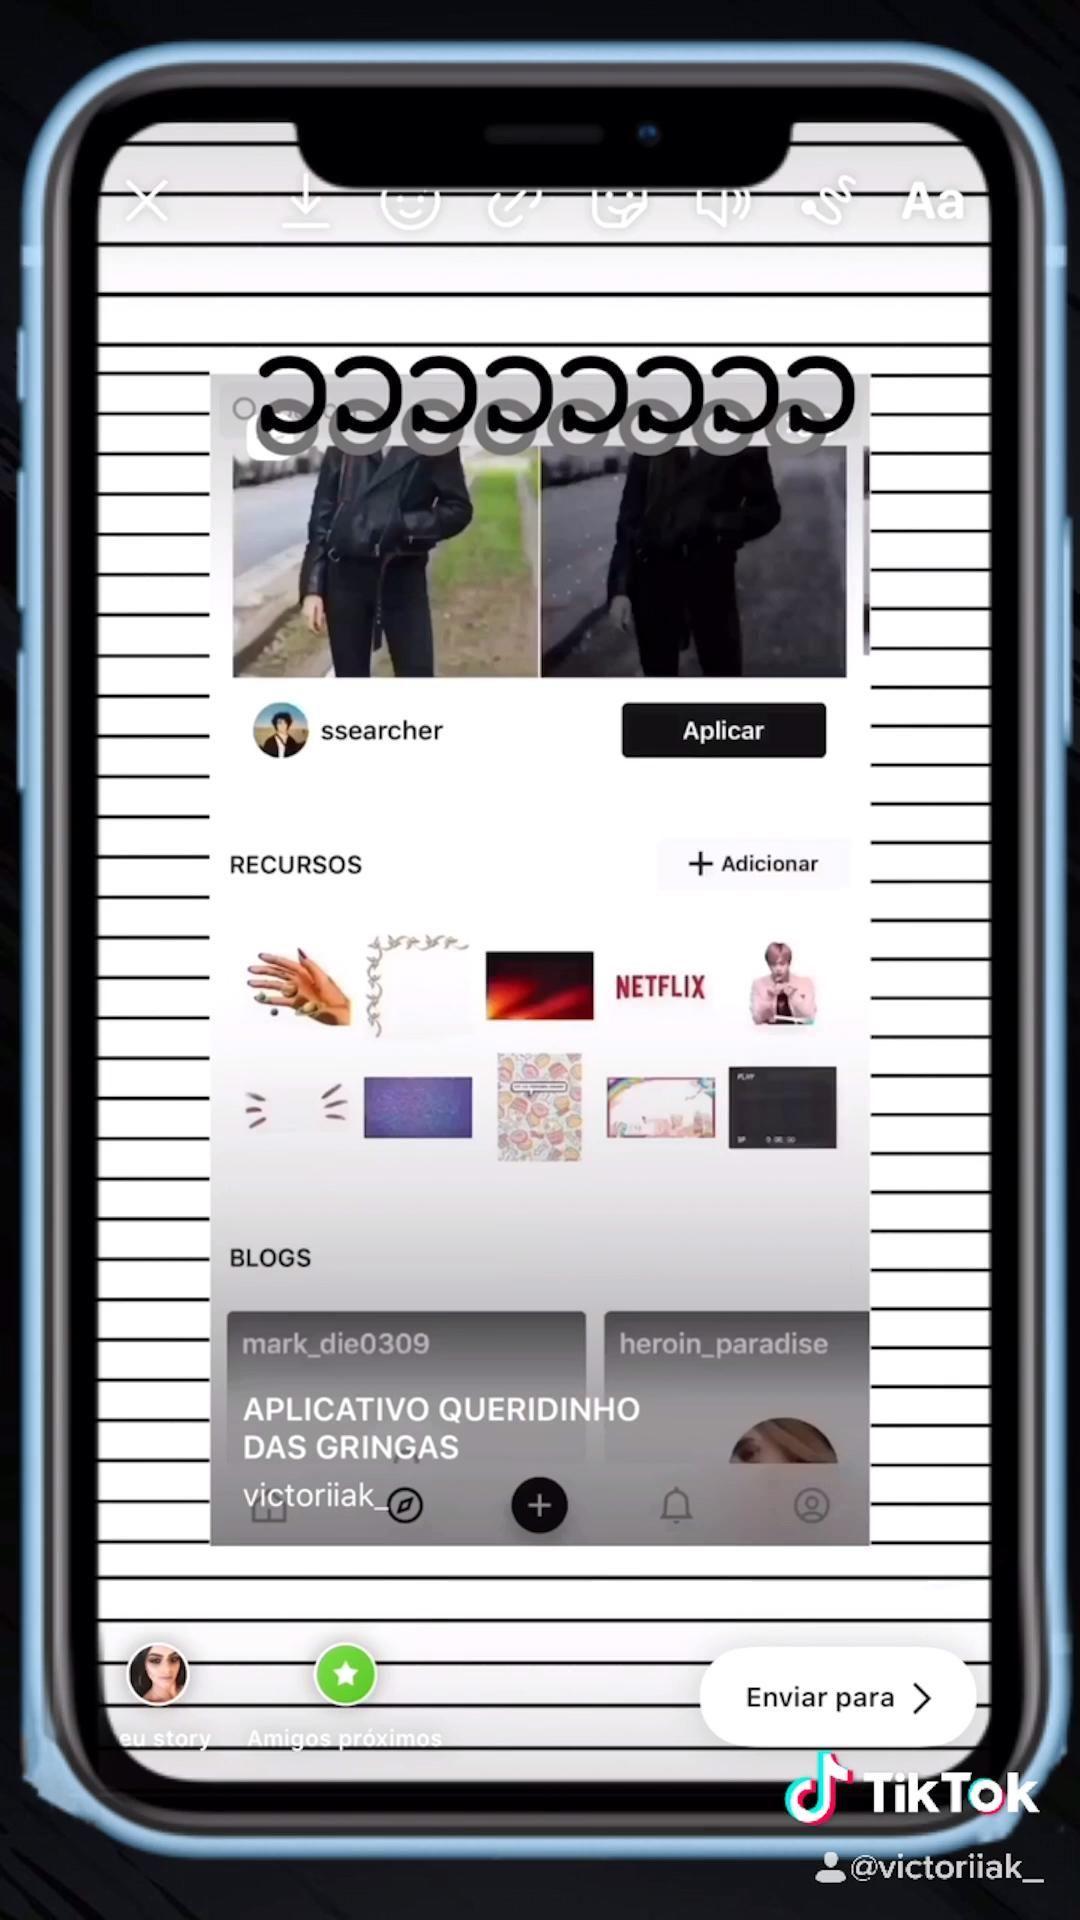 Story criativo new post igtv in 2020 Instagram editing